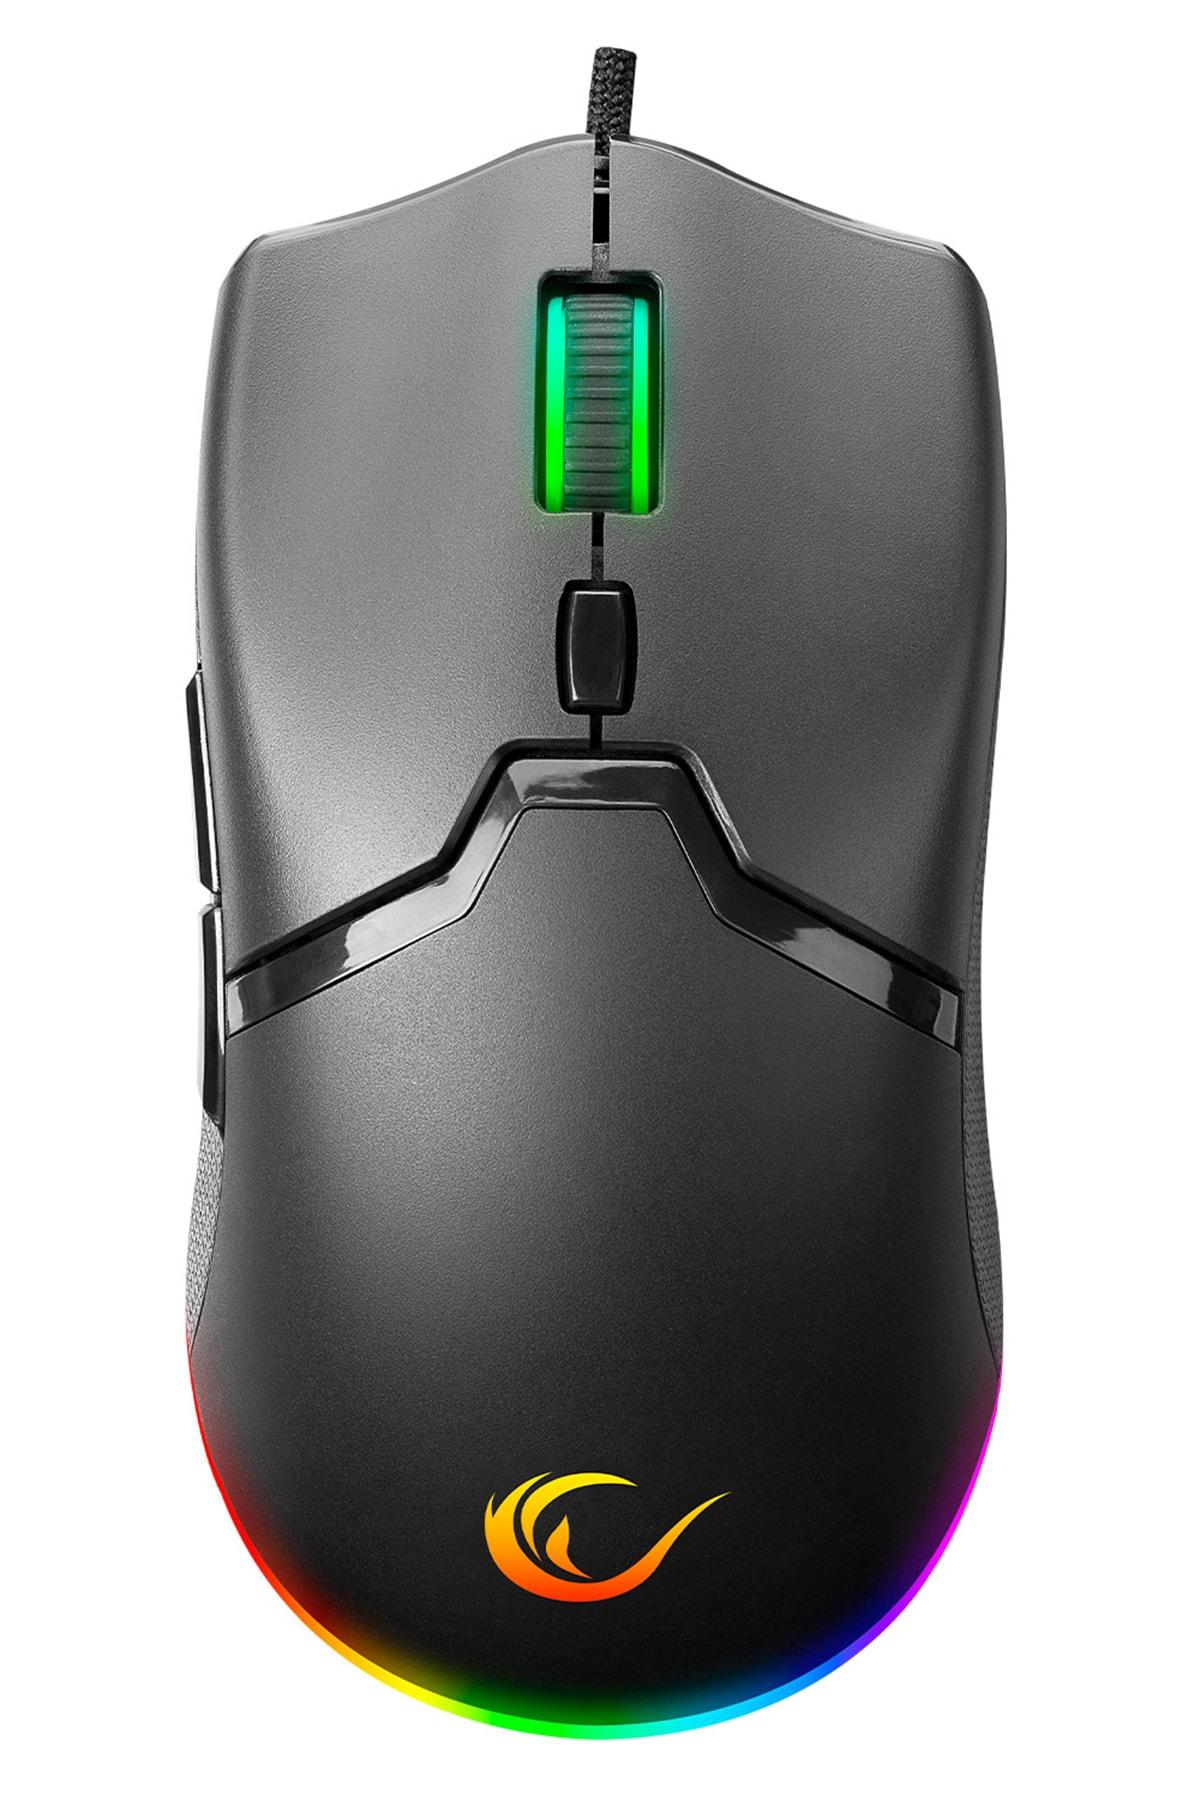 X-space 7200dpı Rgb Ledli Makrolu Gaming Oyuncu Mouse